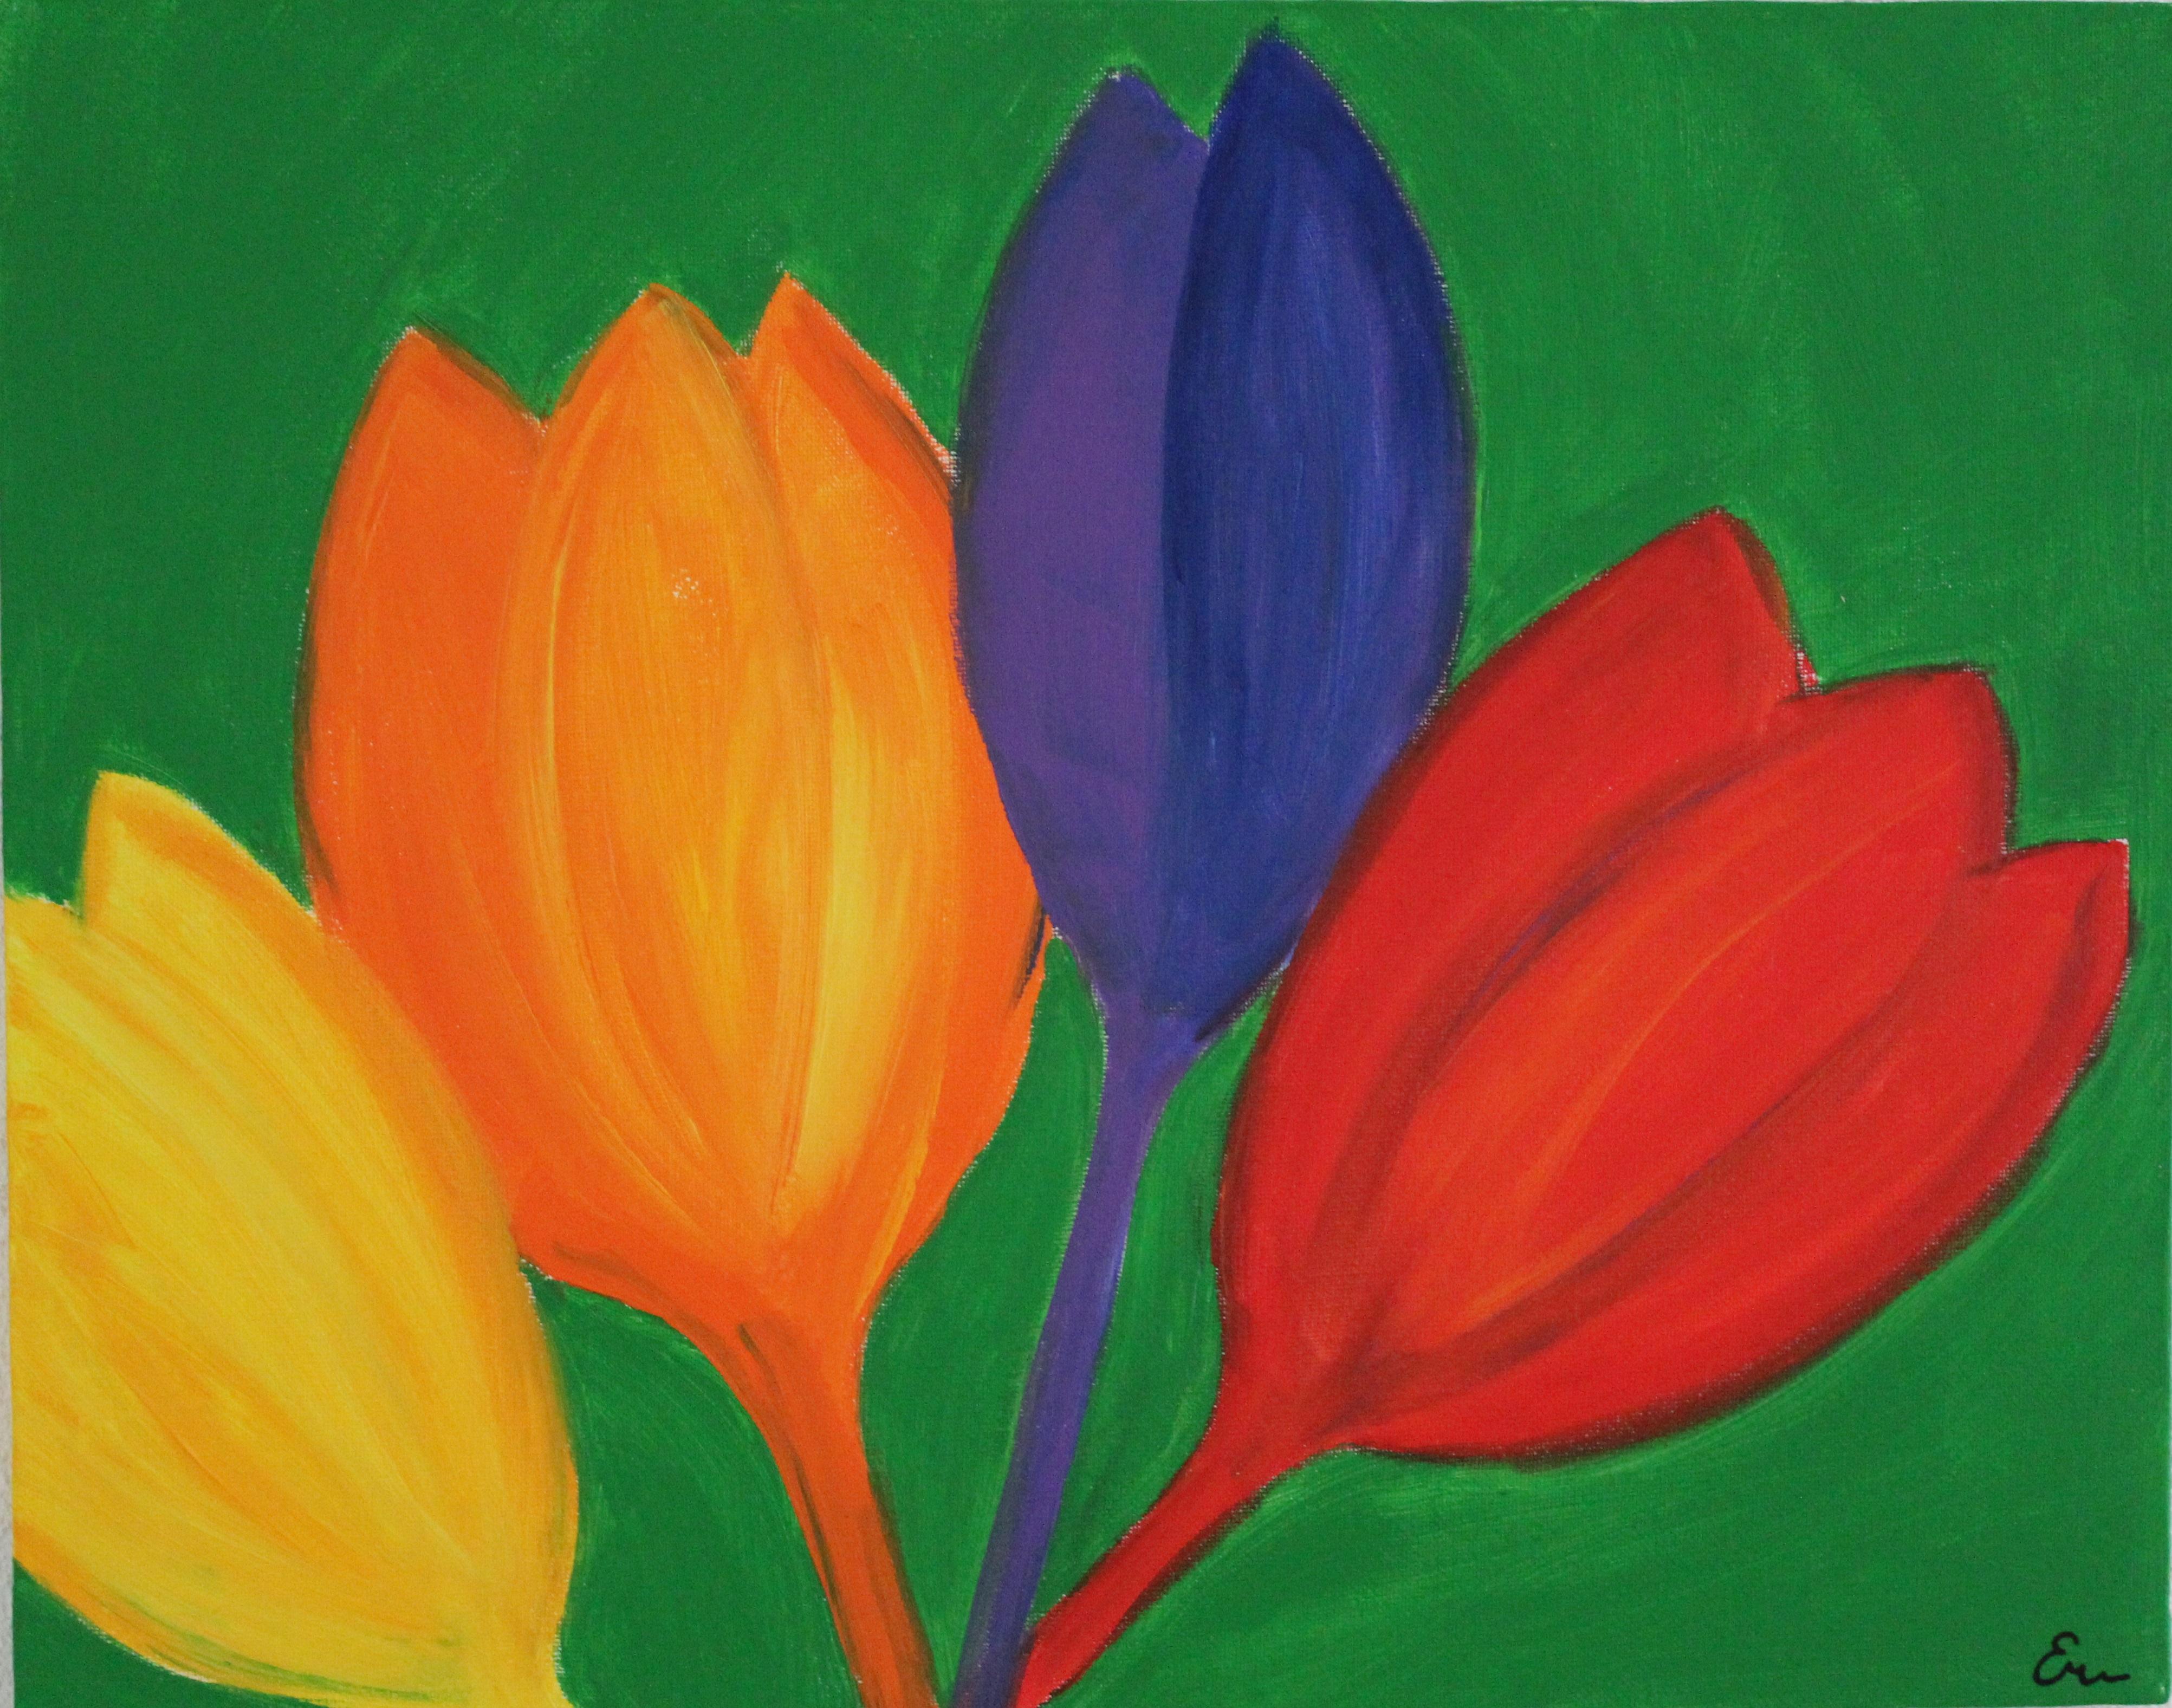 tulpen fel gekleurd acryl op canvas